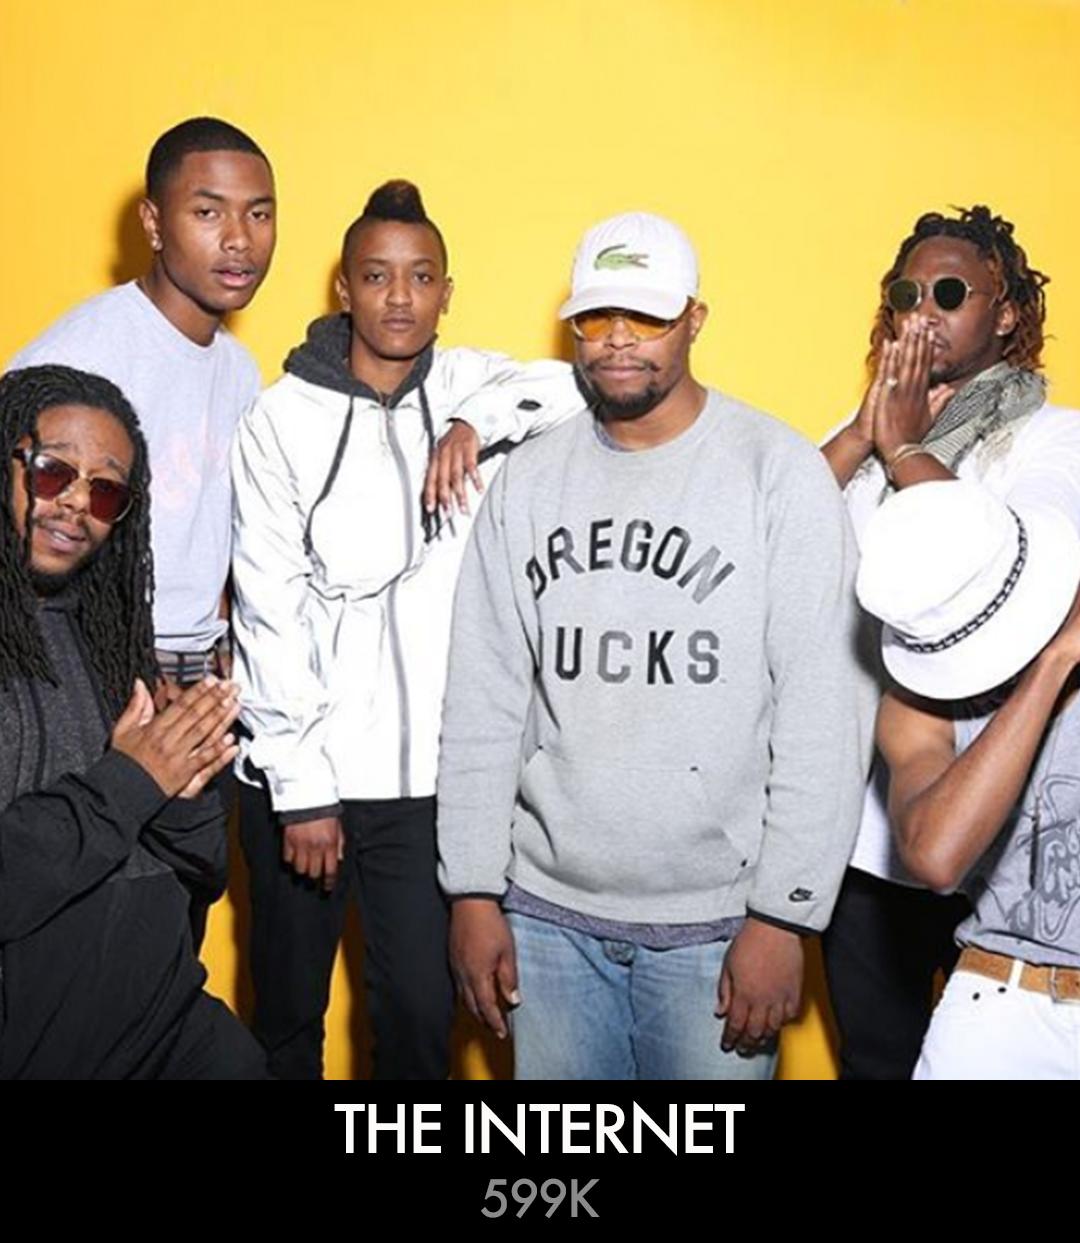 TT_W&B_Deck_Music_TheInternet.png